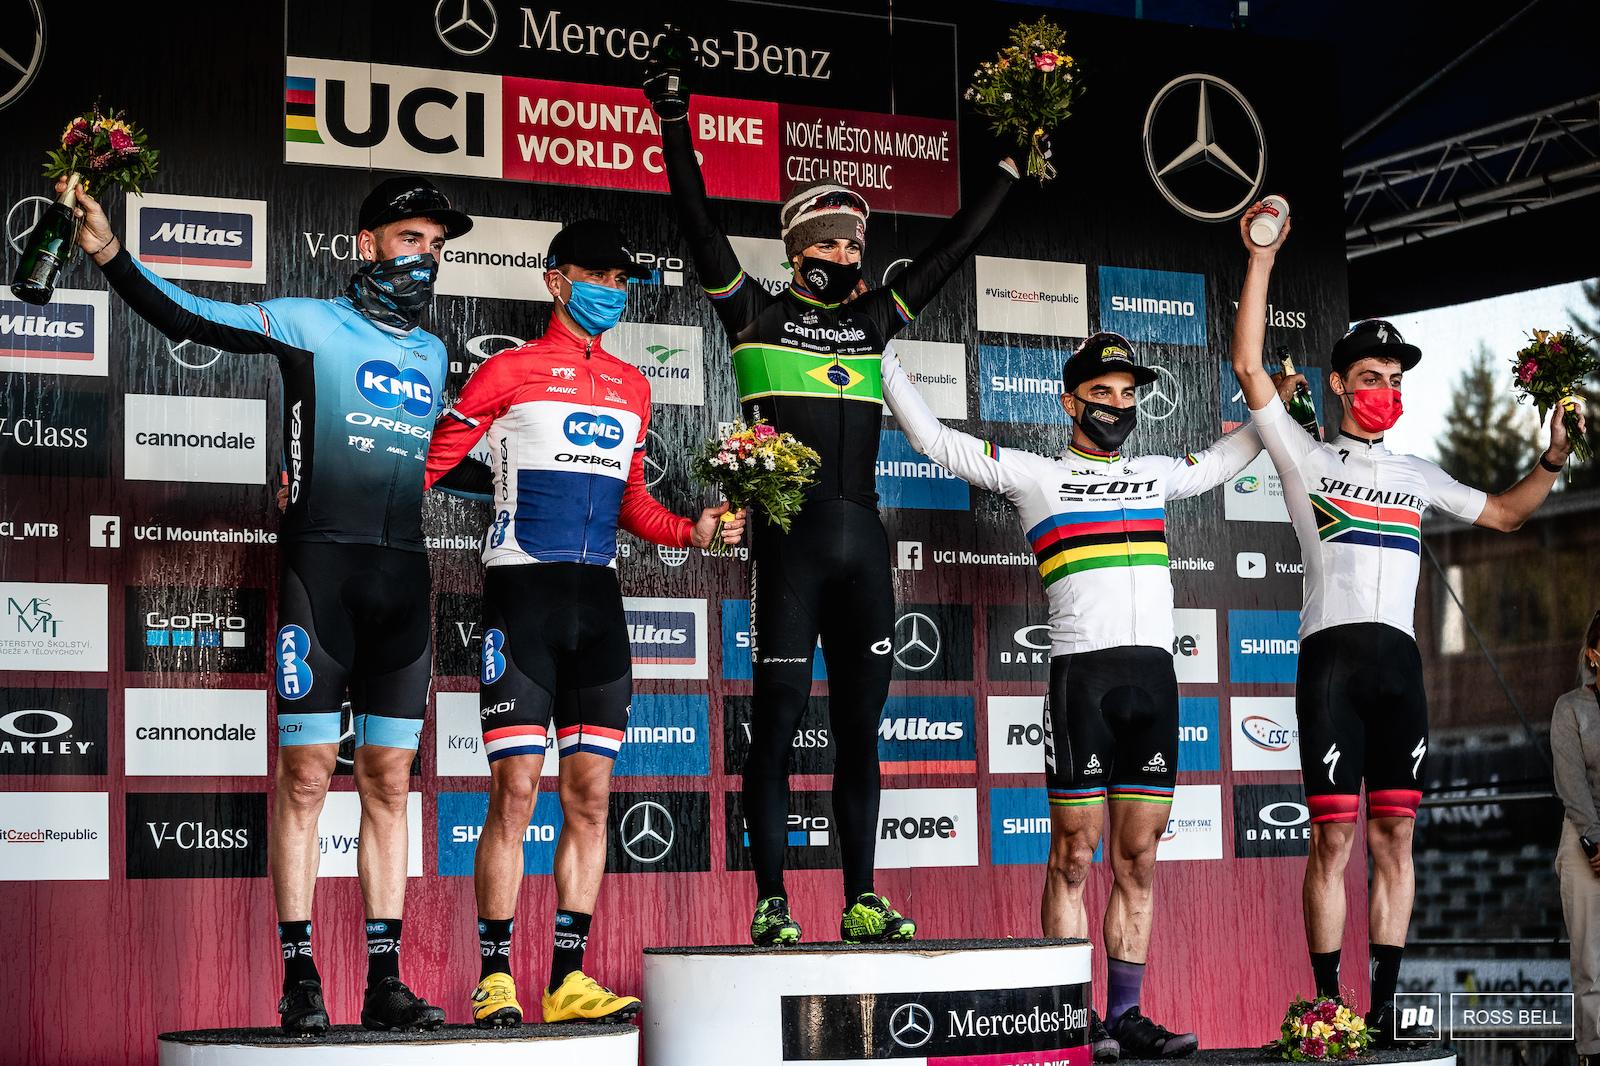 Your top 5 elite men 1st Henrique Avancini 2nd Milan Vadar 3rd Nino Schurter 4th Victor Kortetzky 5th Alan Hatherly